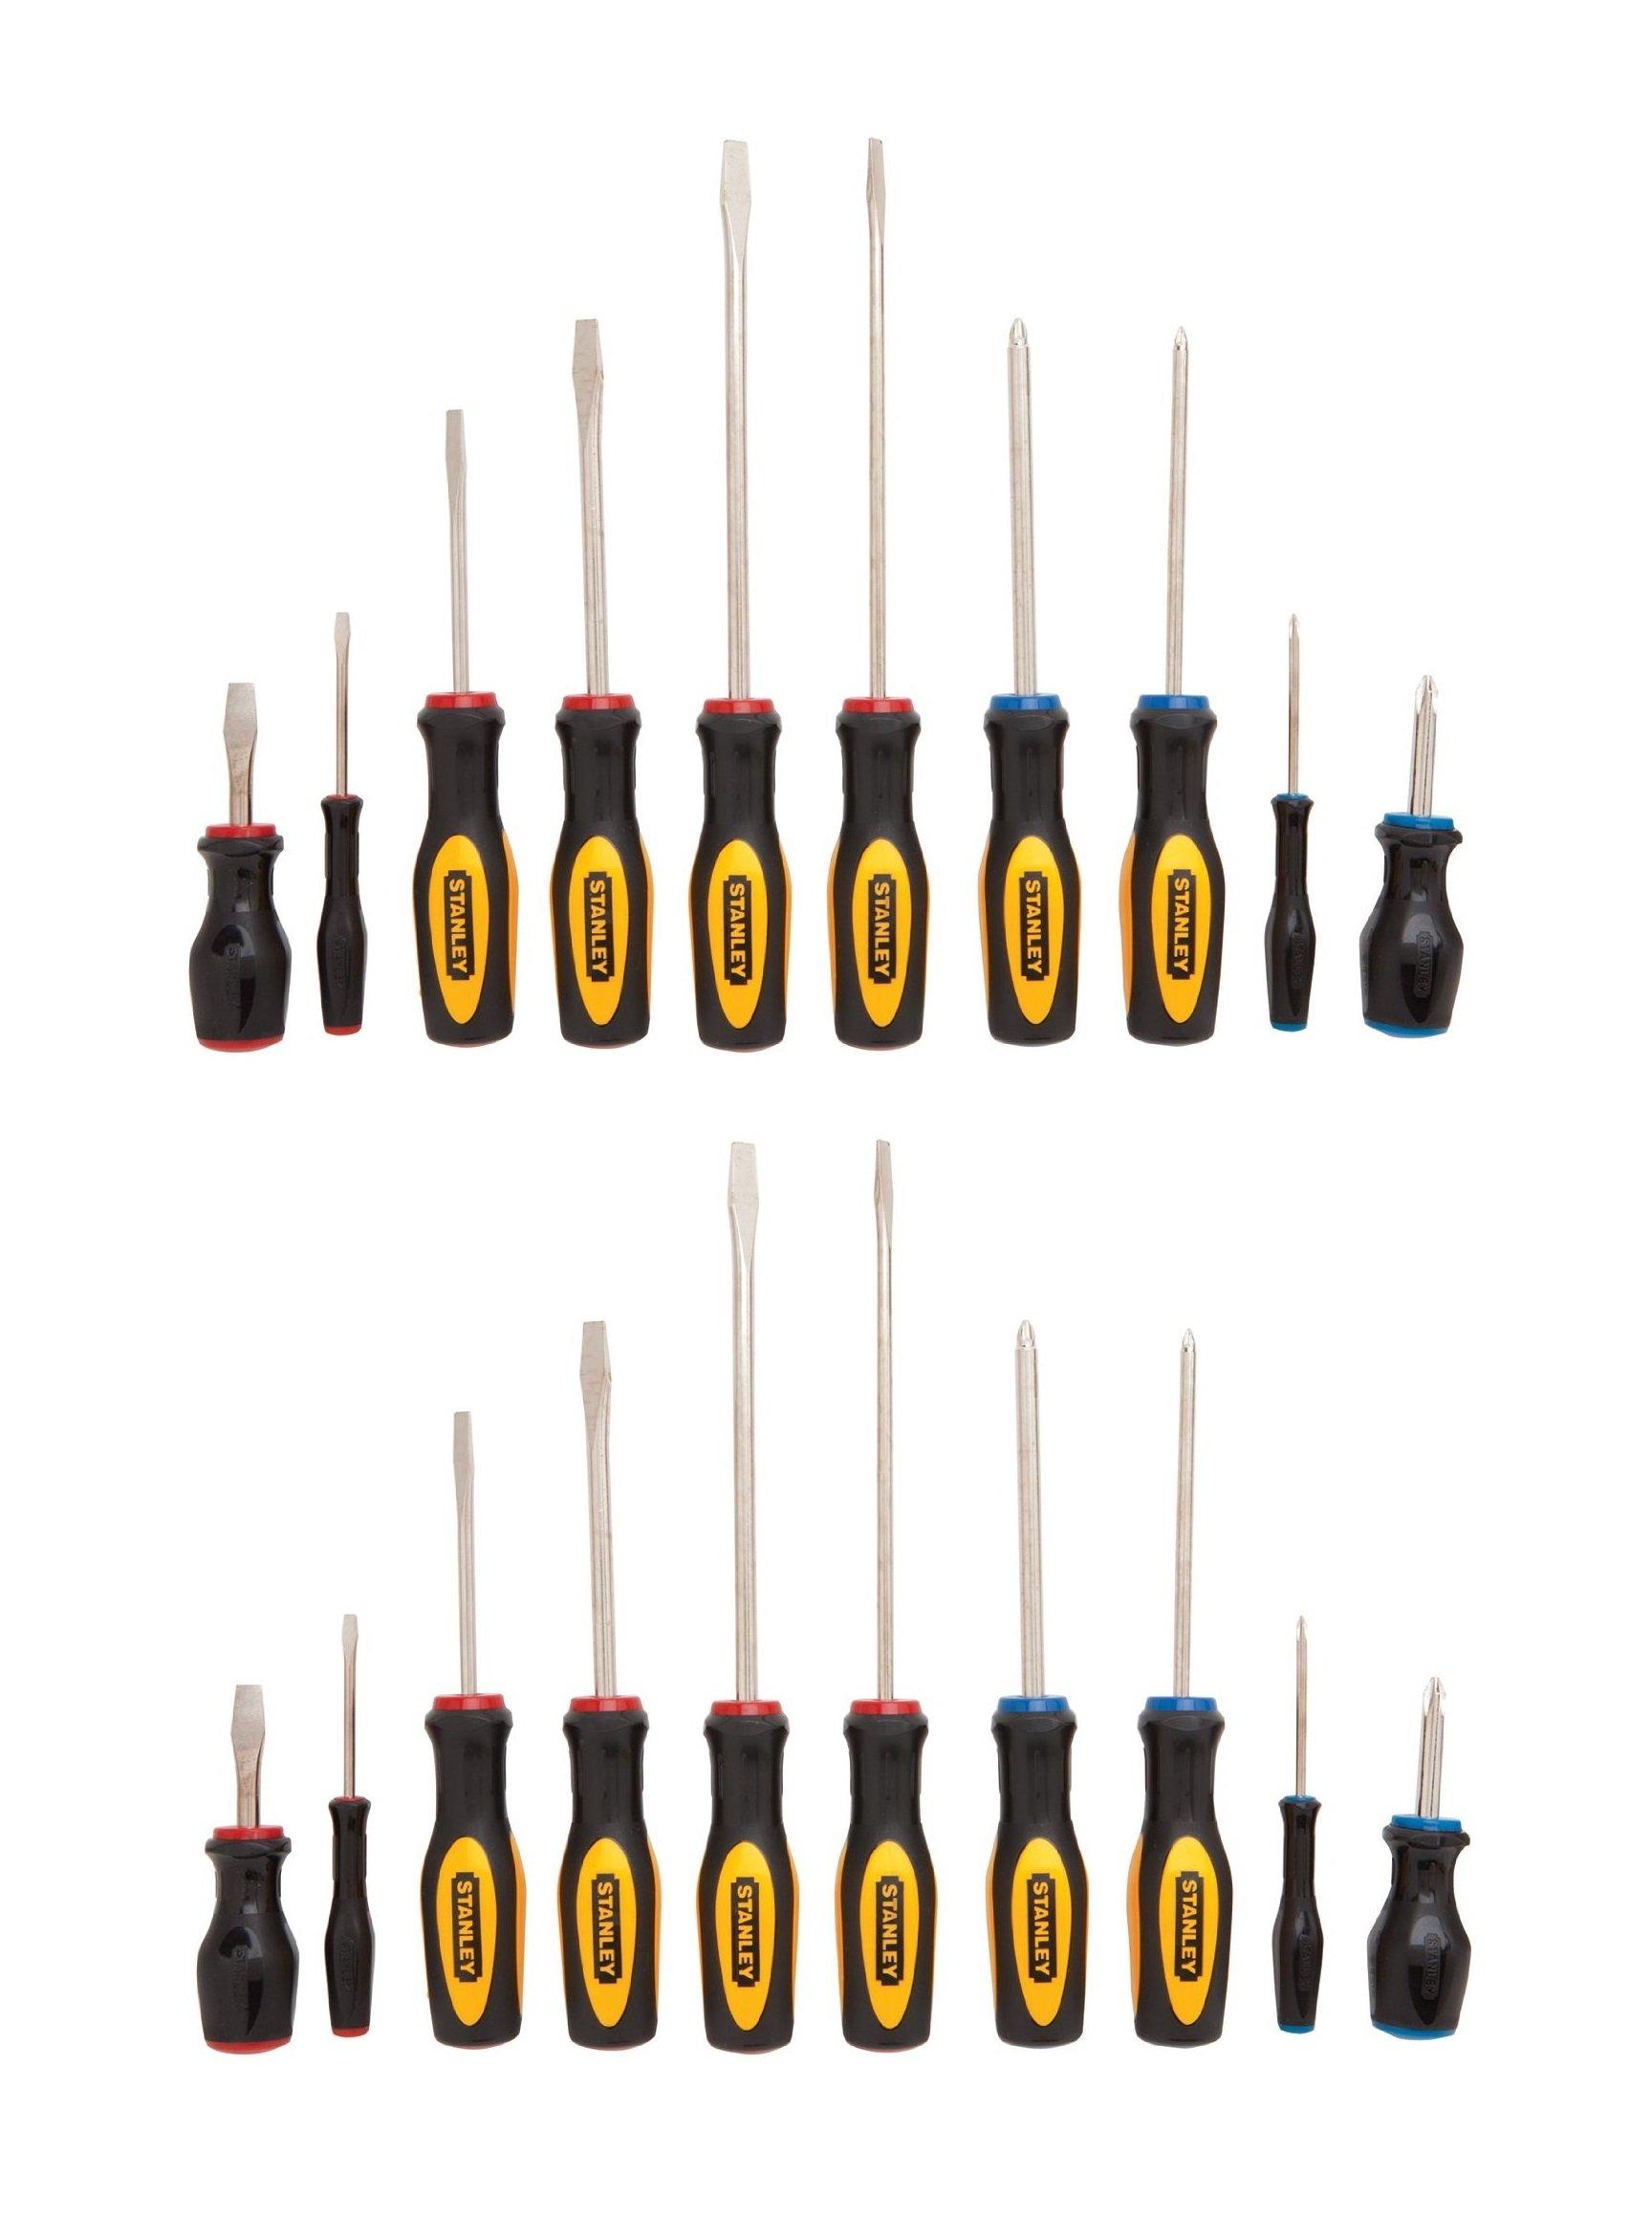 Stanley 60-100 10 Piece Standard Fluted Screwdriver Set (2 Pack)